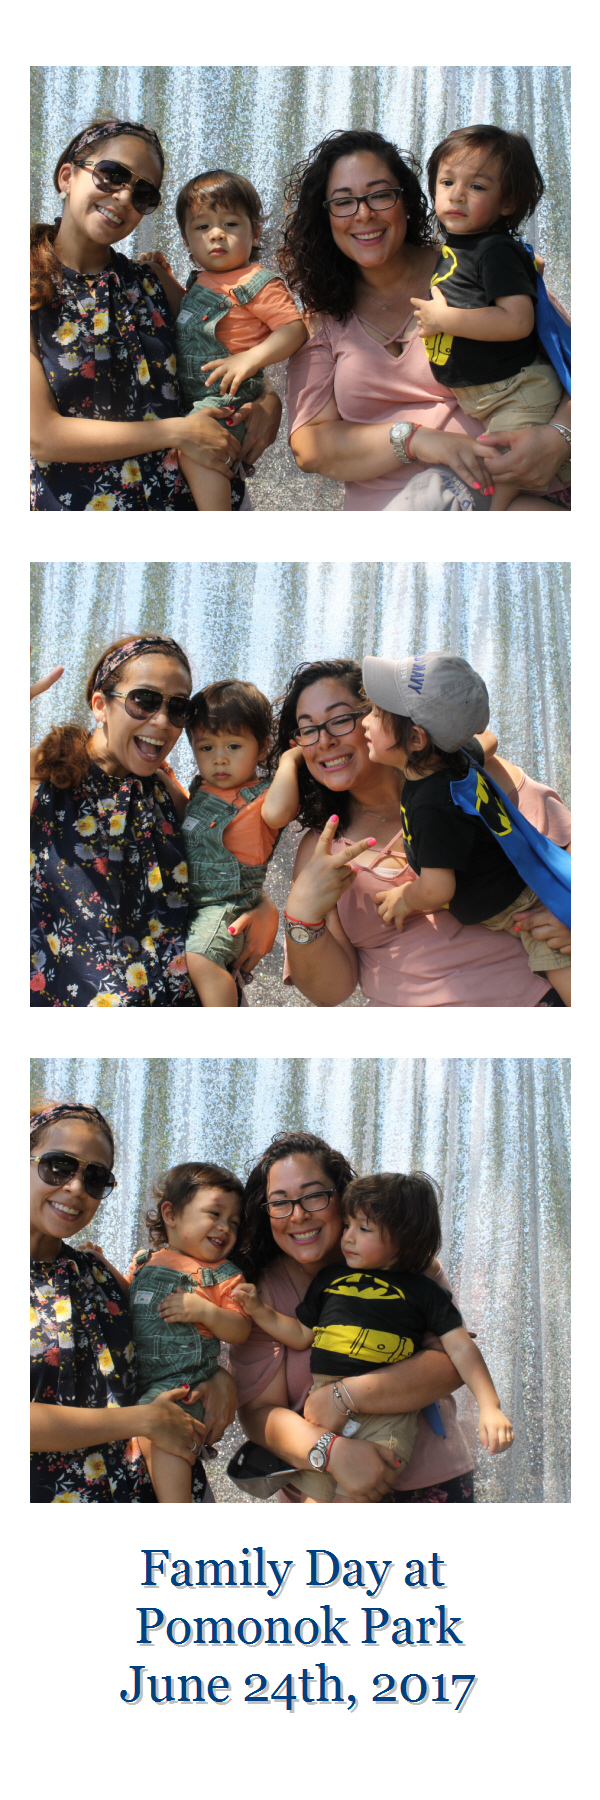 Family Day at Pomonok Park